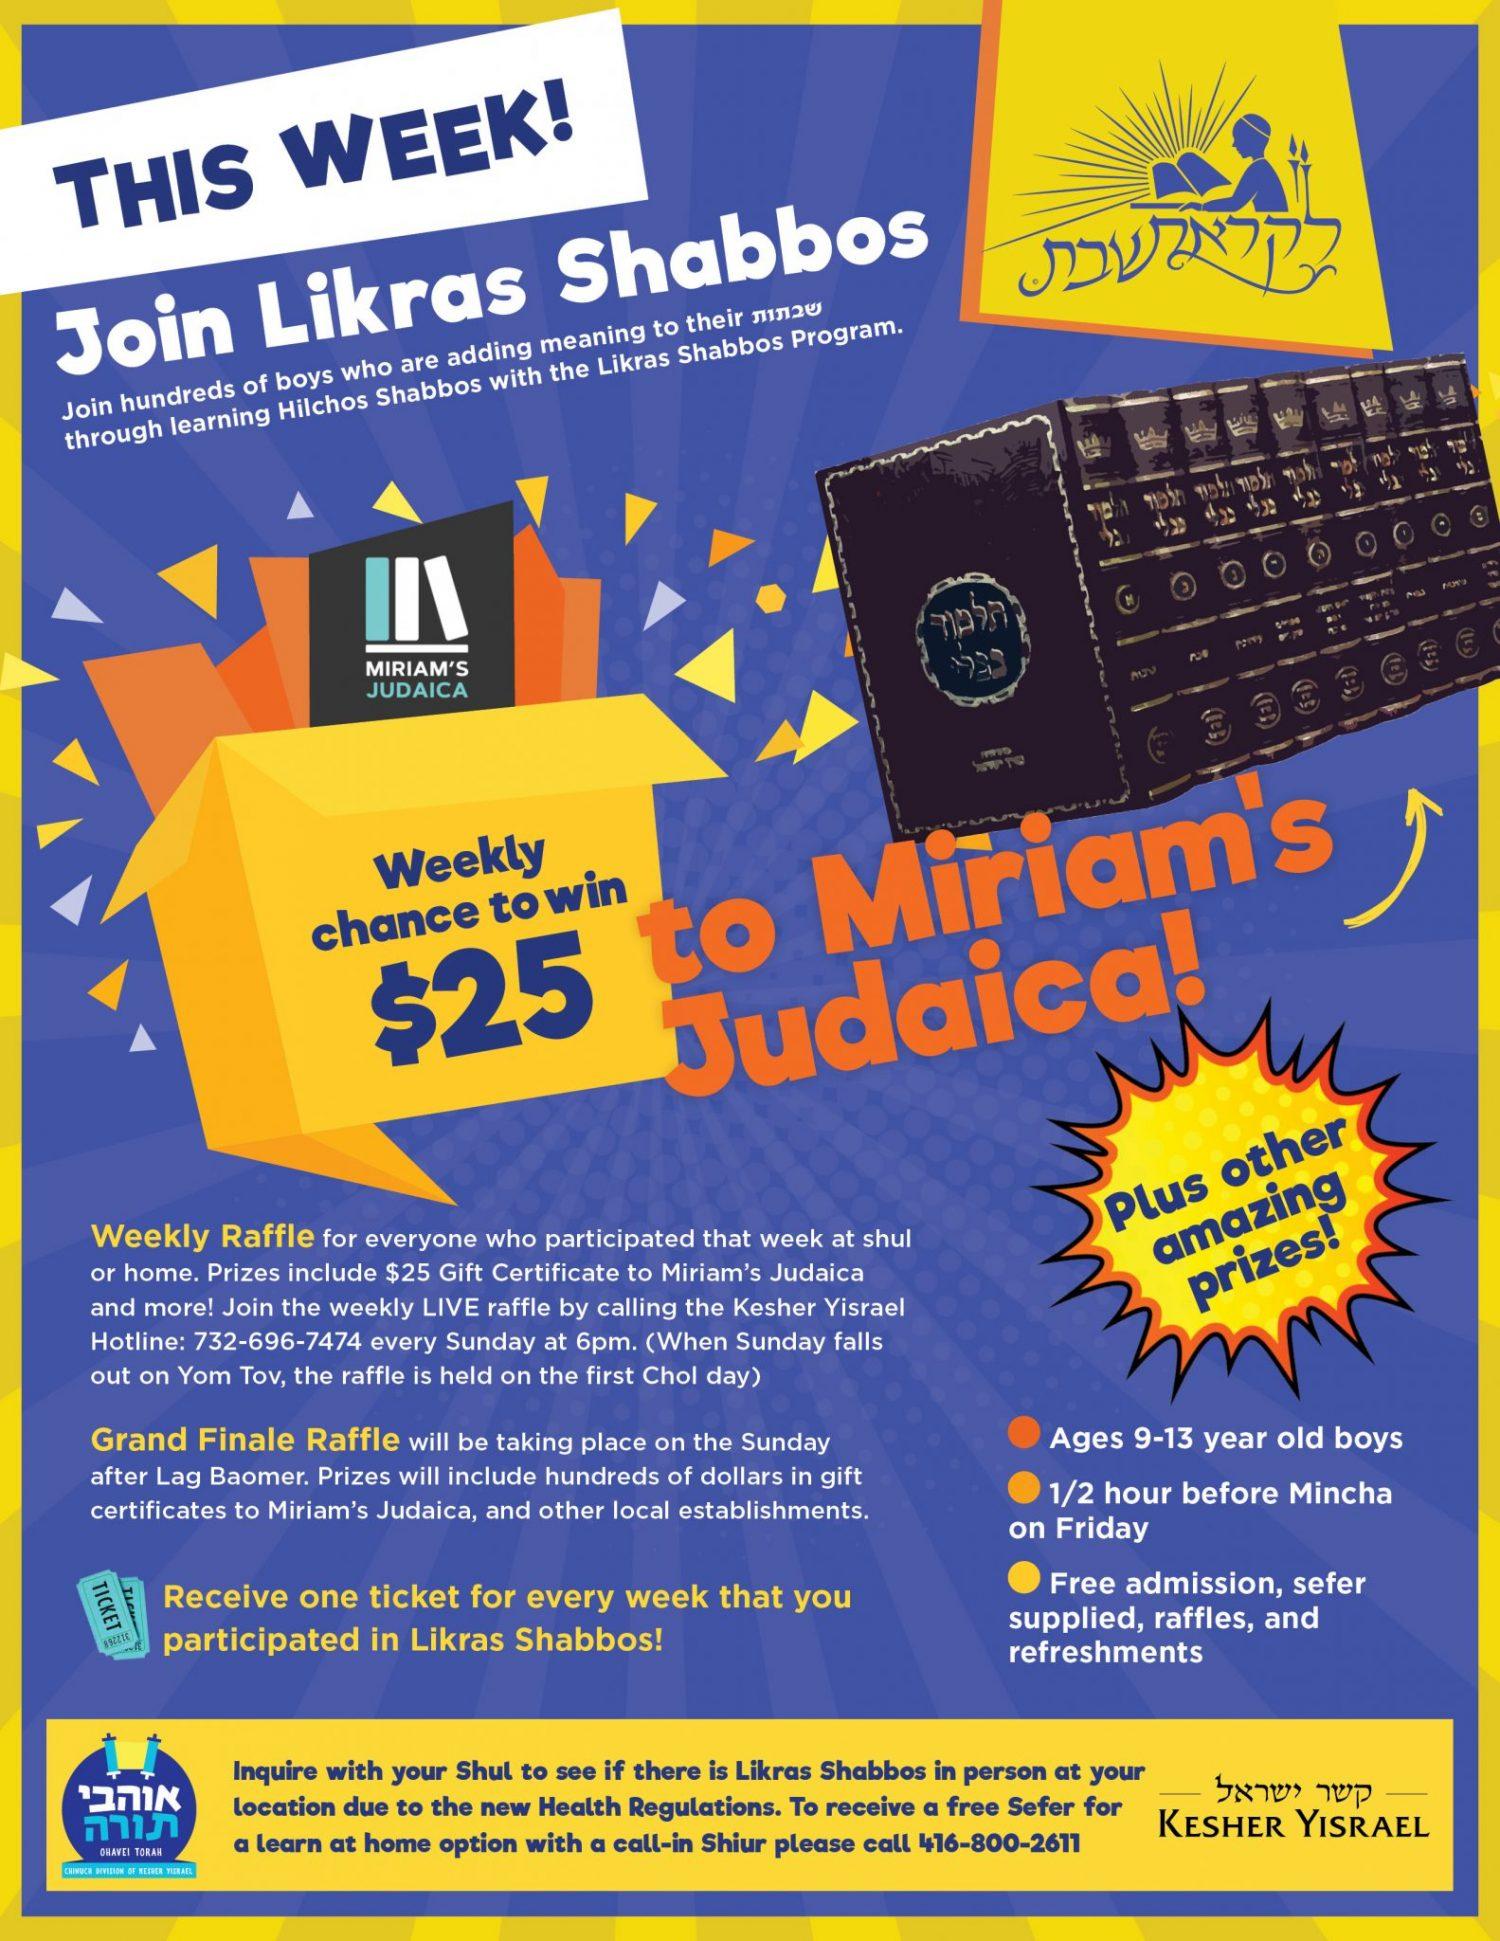 Likras Shabbos